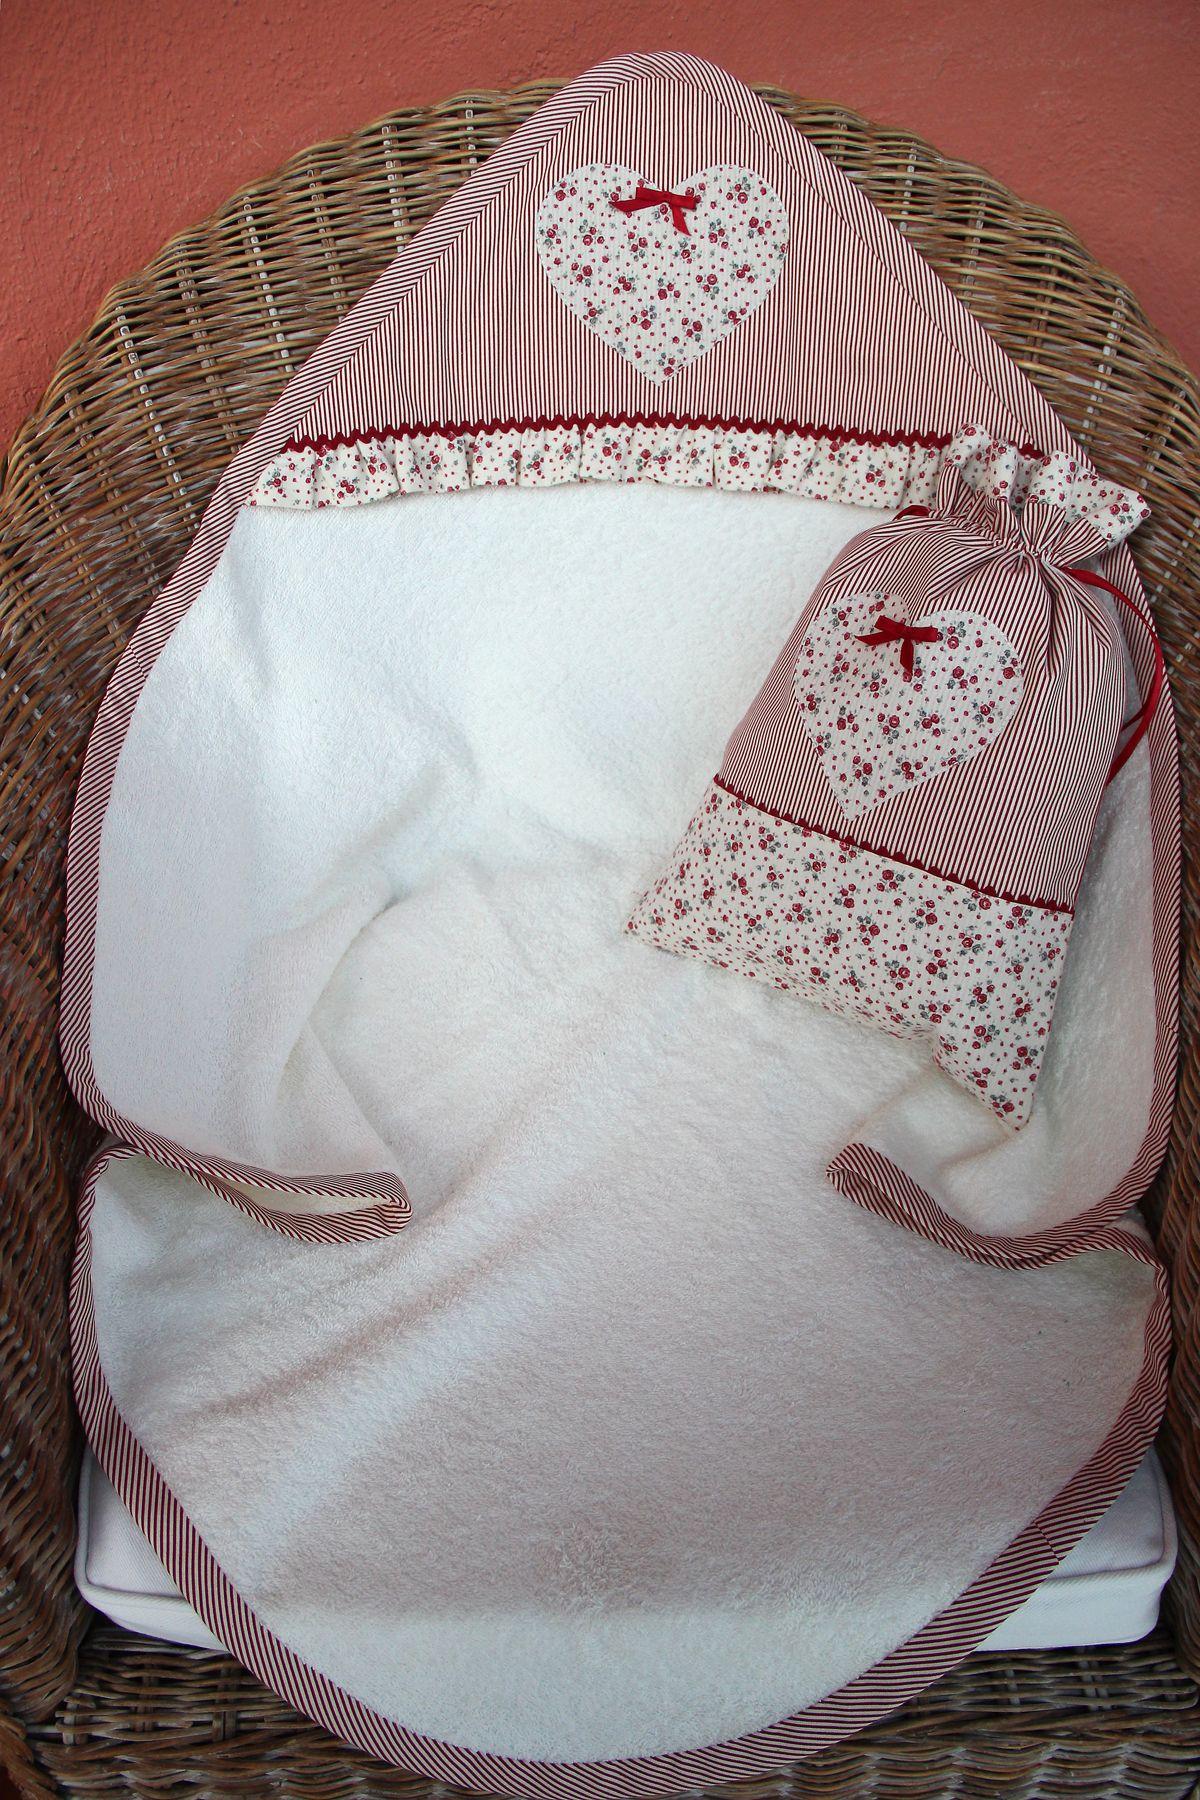 Toalla bebe con capucha toallas bebe con capucha - Toalla bano bebe ...